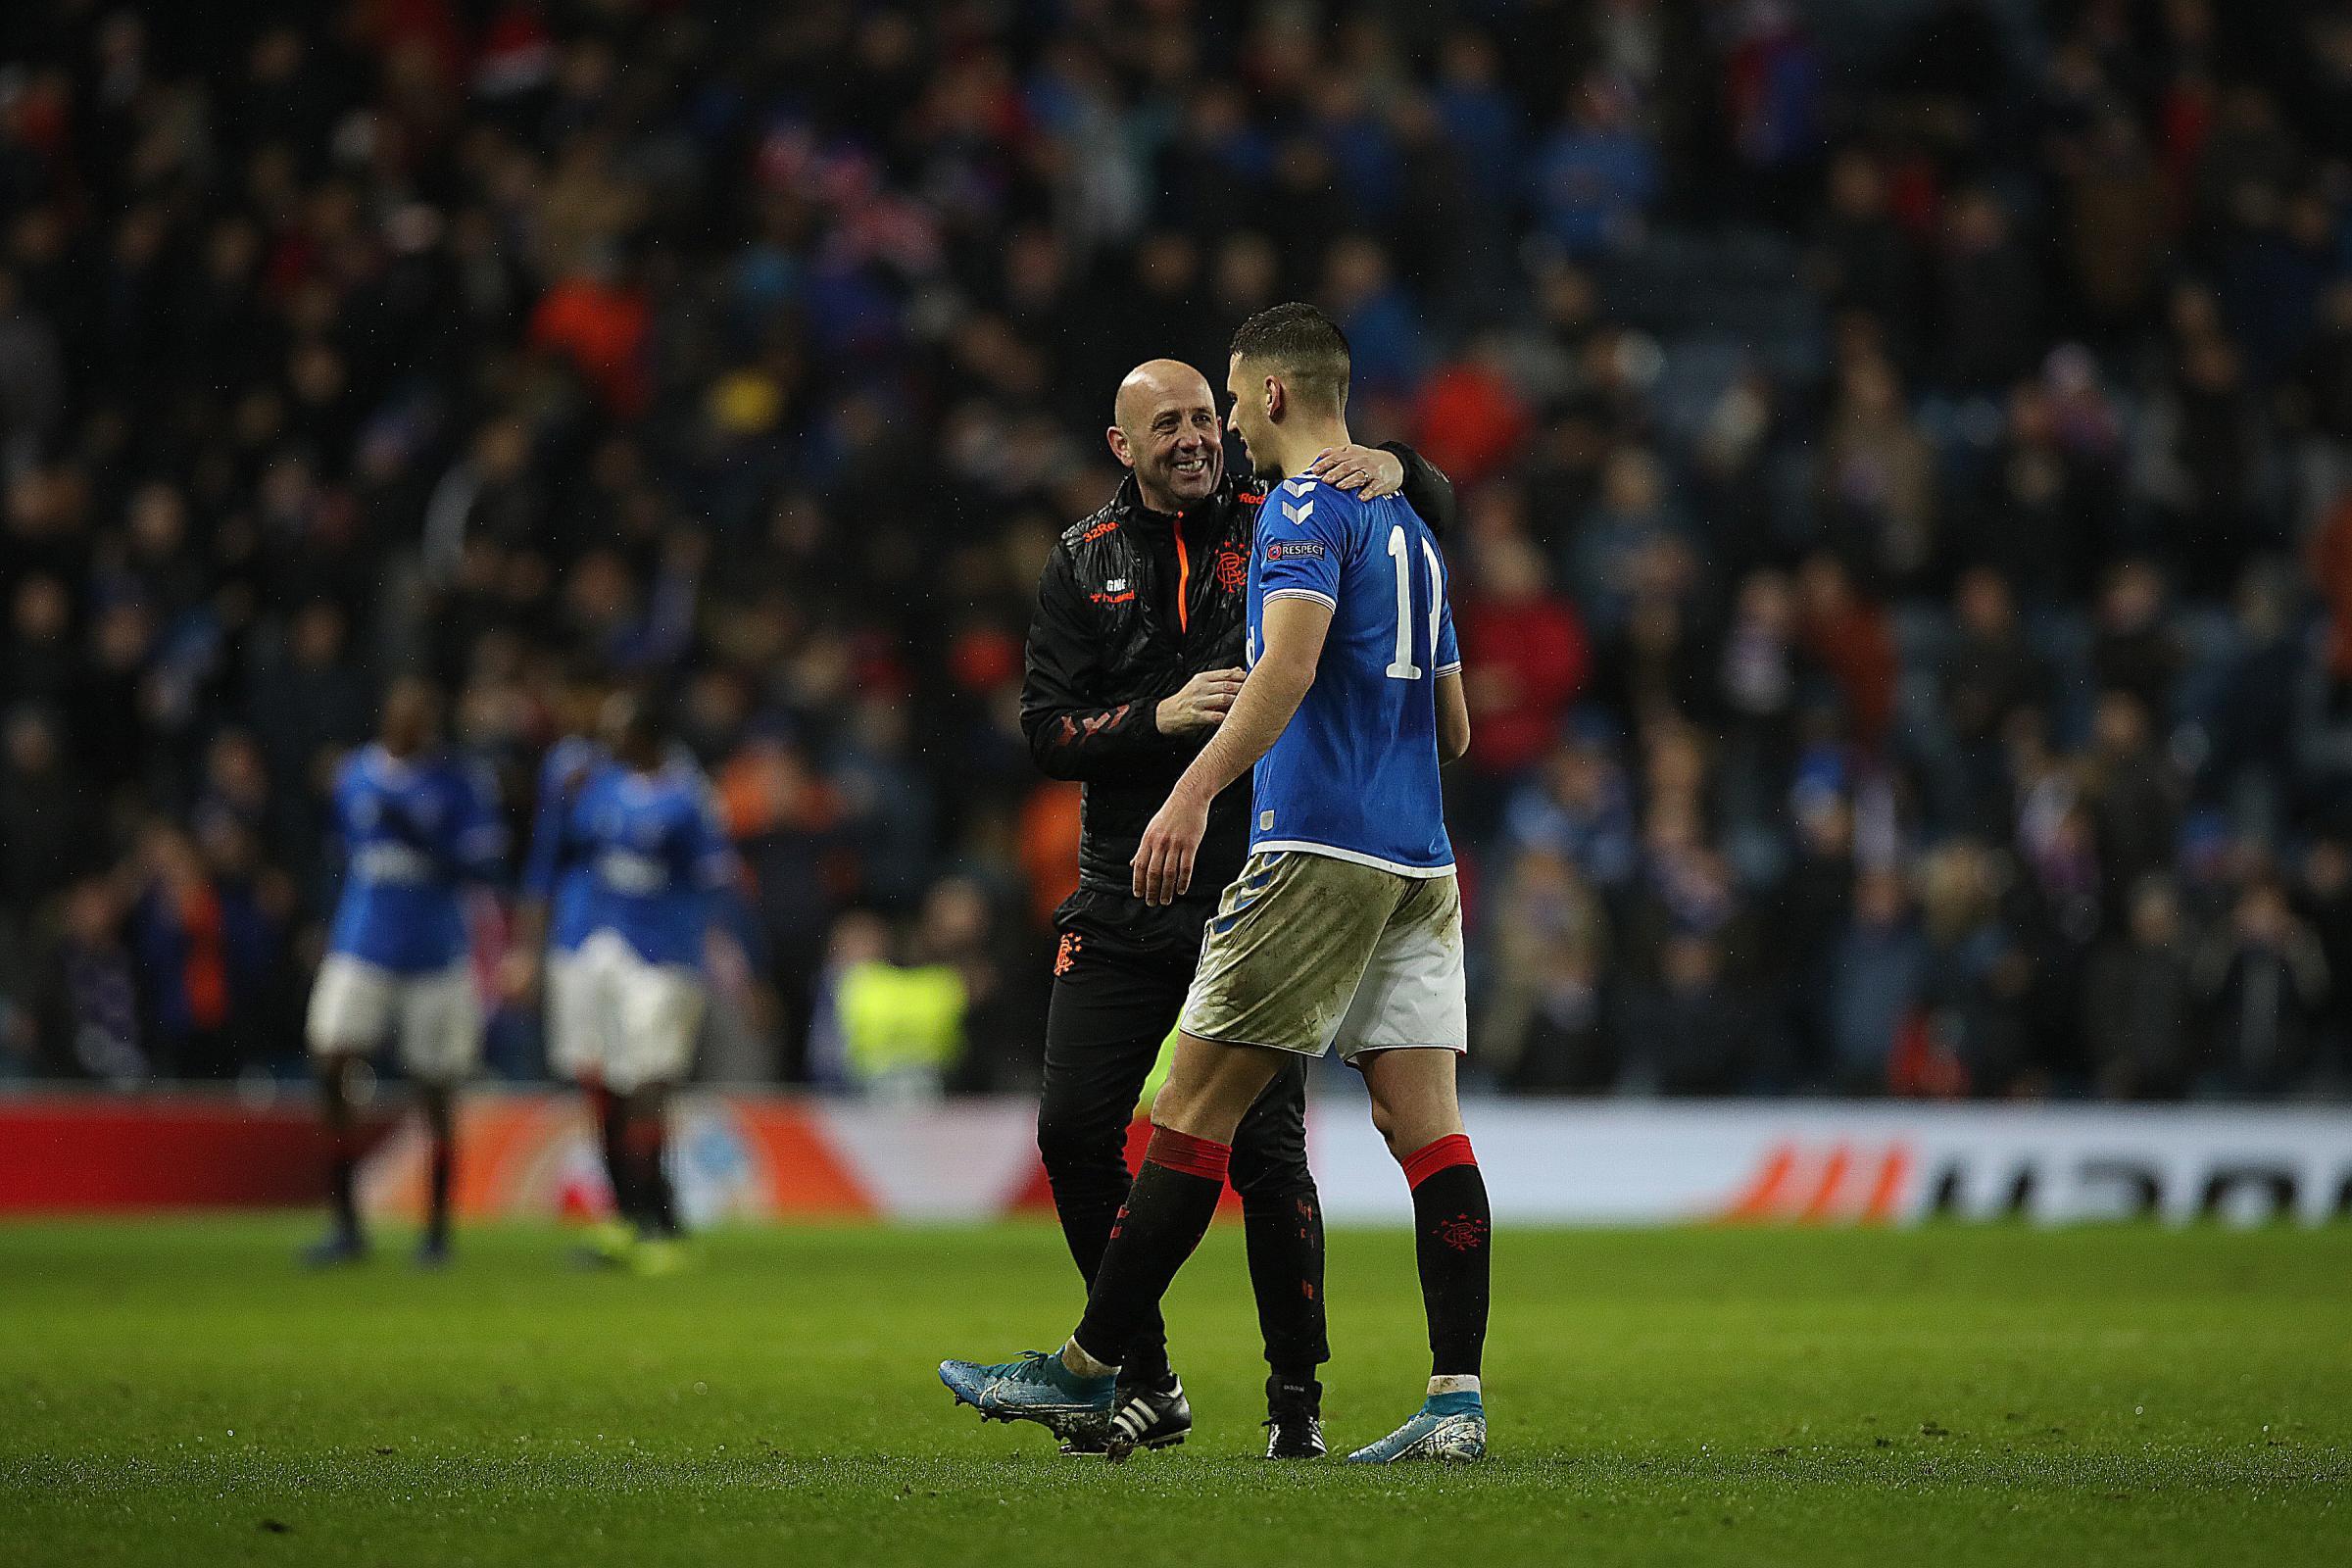 Nikola Katic fancies Rangers' chances against Manchester United as Steven Gerrard's side await Europa League draw